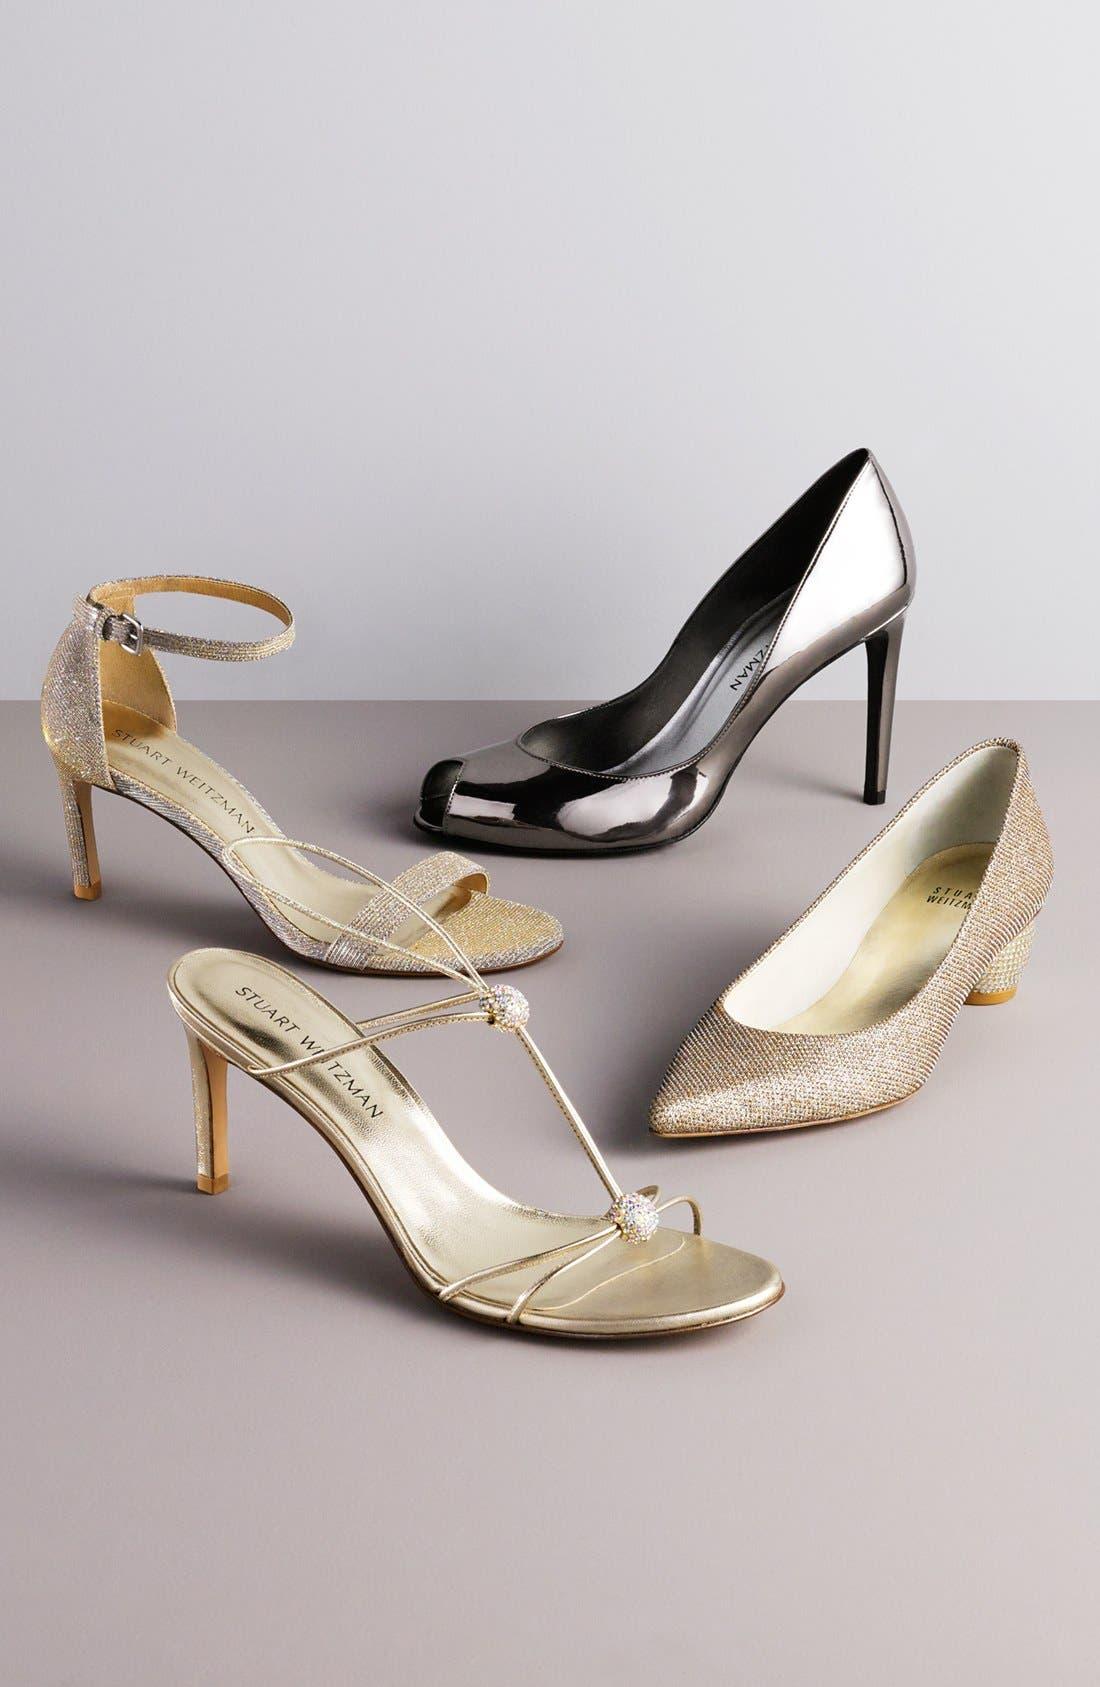 STUART WEITZMAN 'Nunaked' Leather Ankle Strap Sandal, Main, color, 001